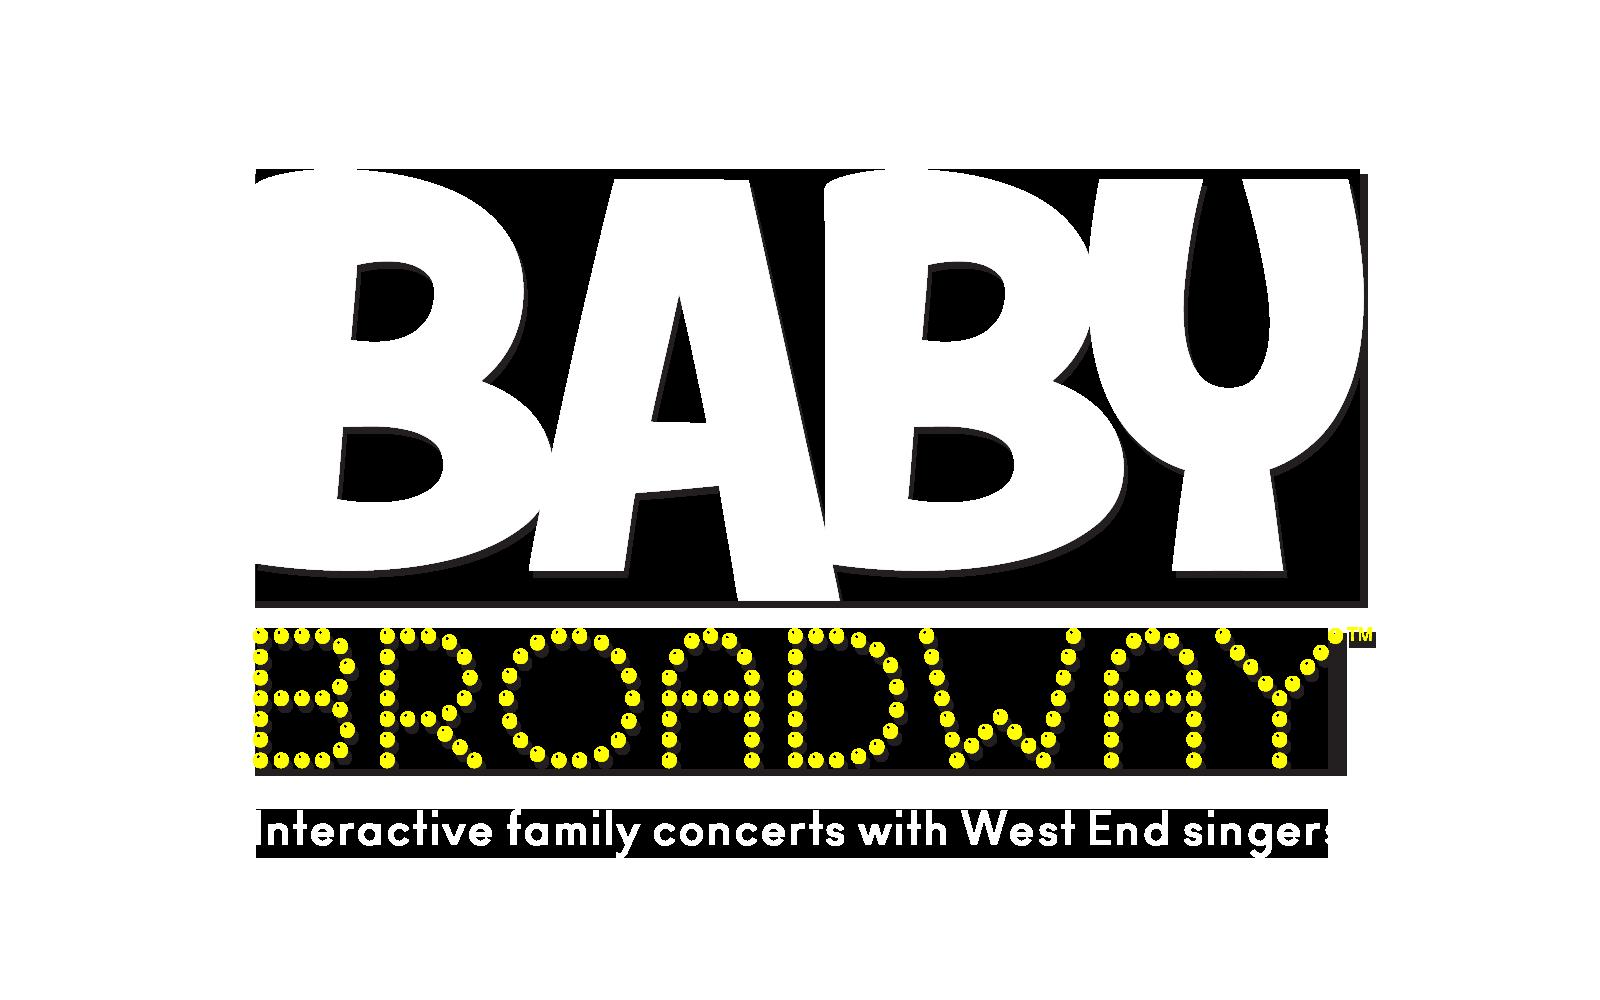 Baby Broadway